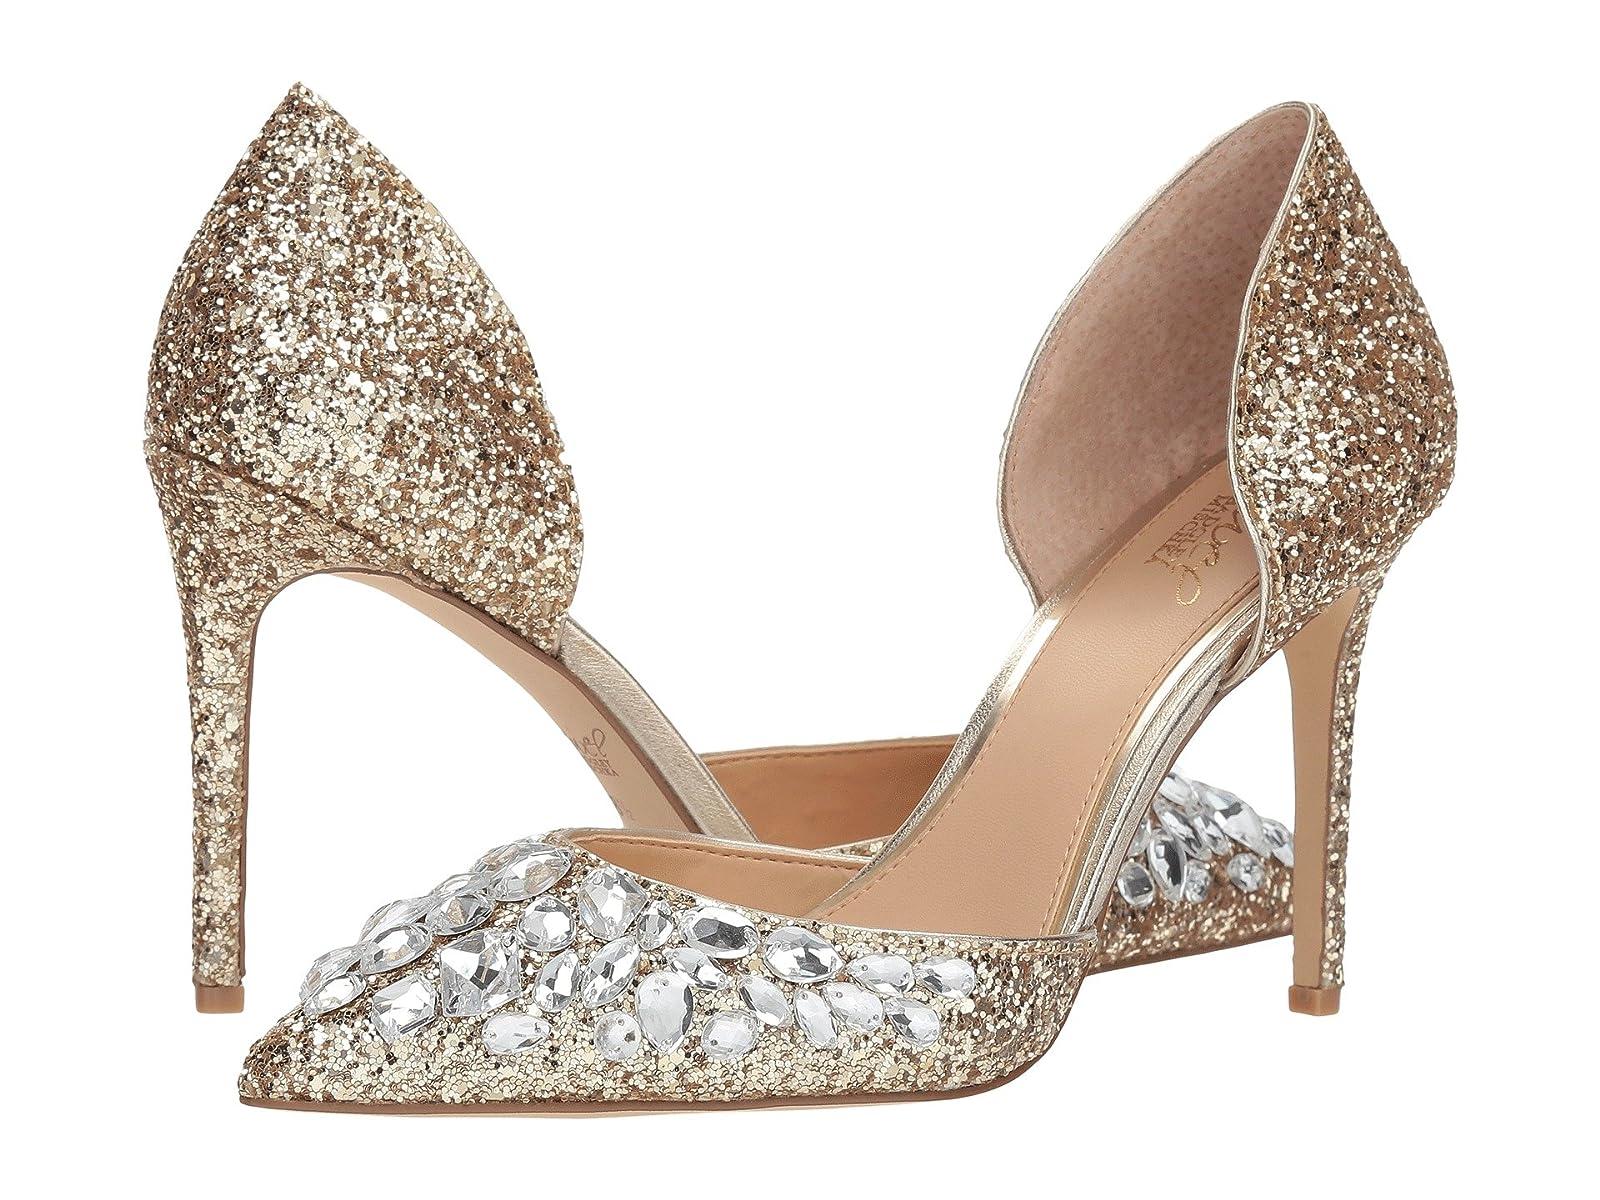 Jewel Badgley Mischka UptonCheap and distinctive eye-catching shoes